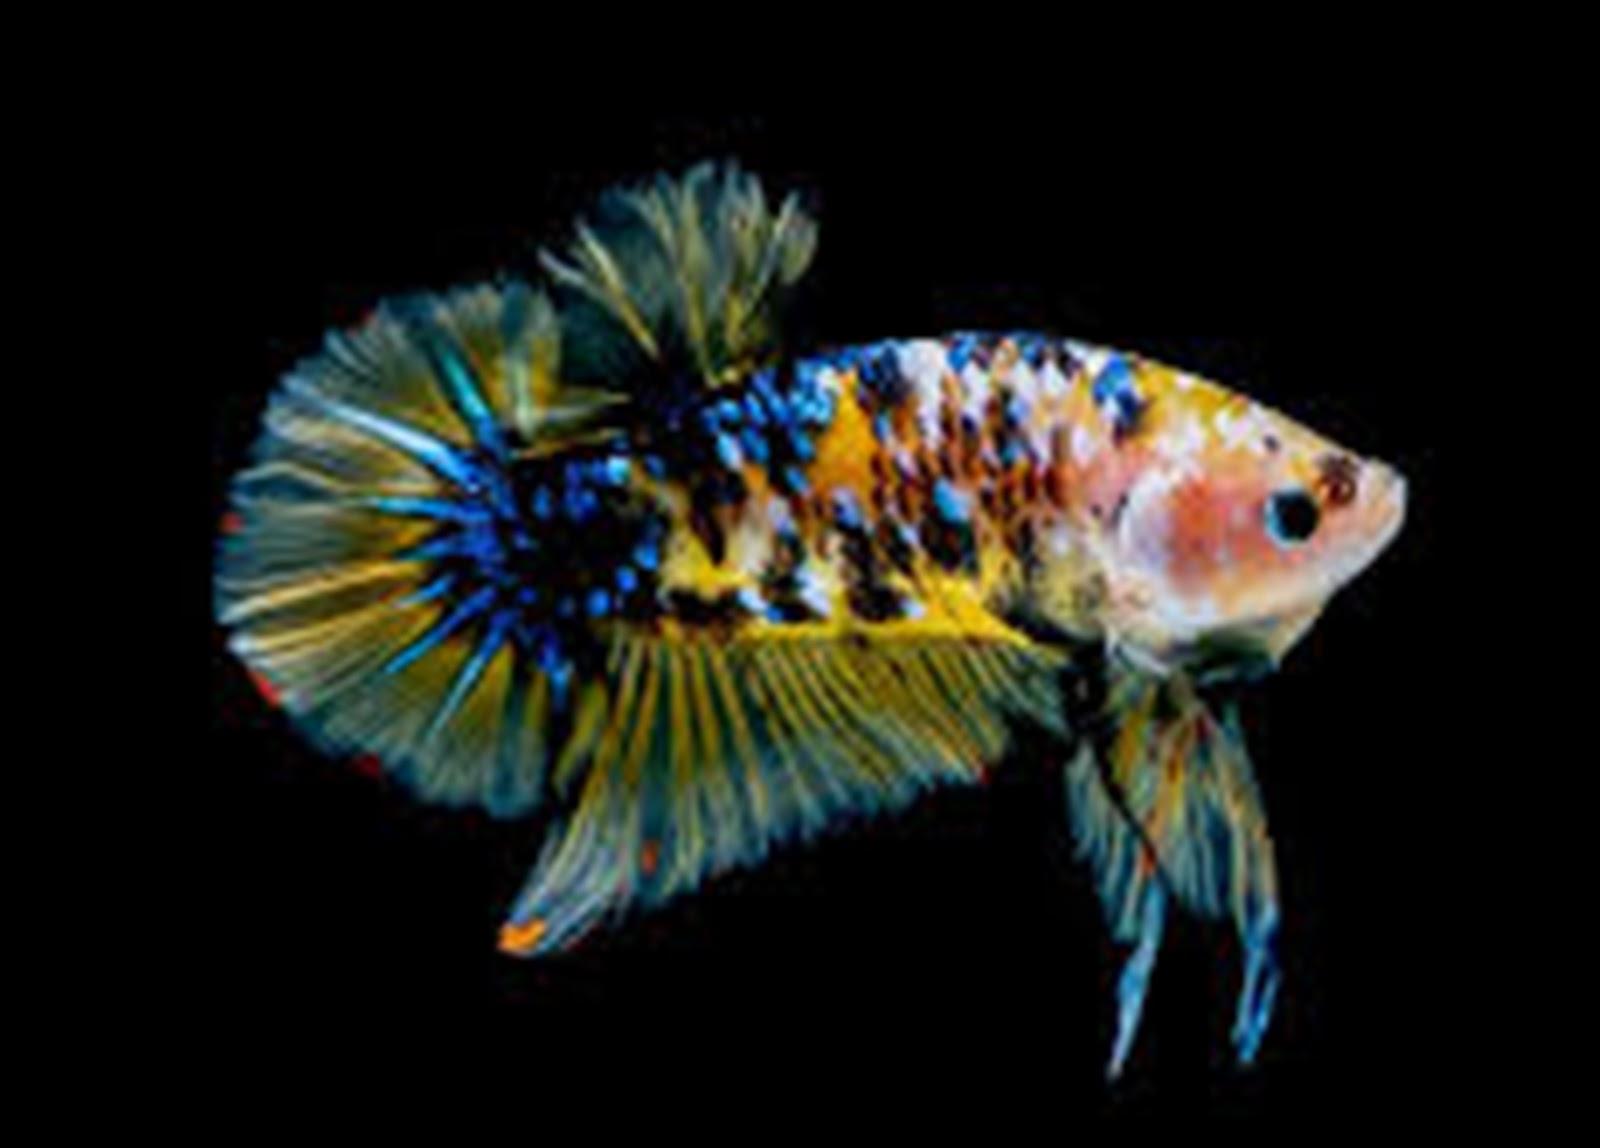 26+ harga ikan cupang indukan images. Supplier Ikan Cupang Bibit dan Hias di Yogyakarta - #1 ...